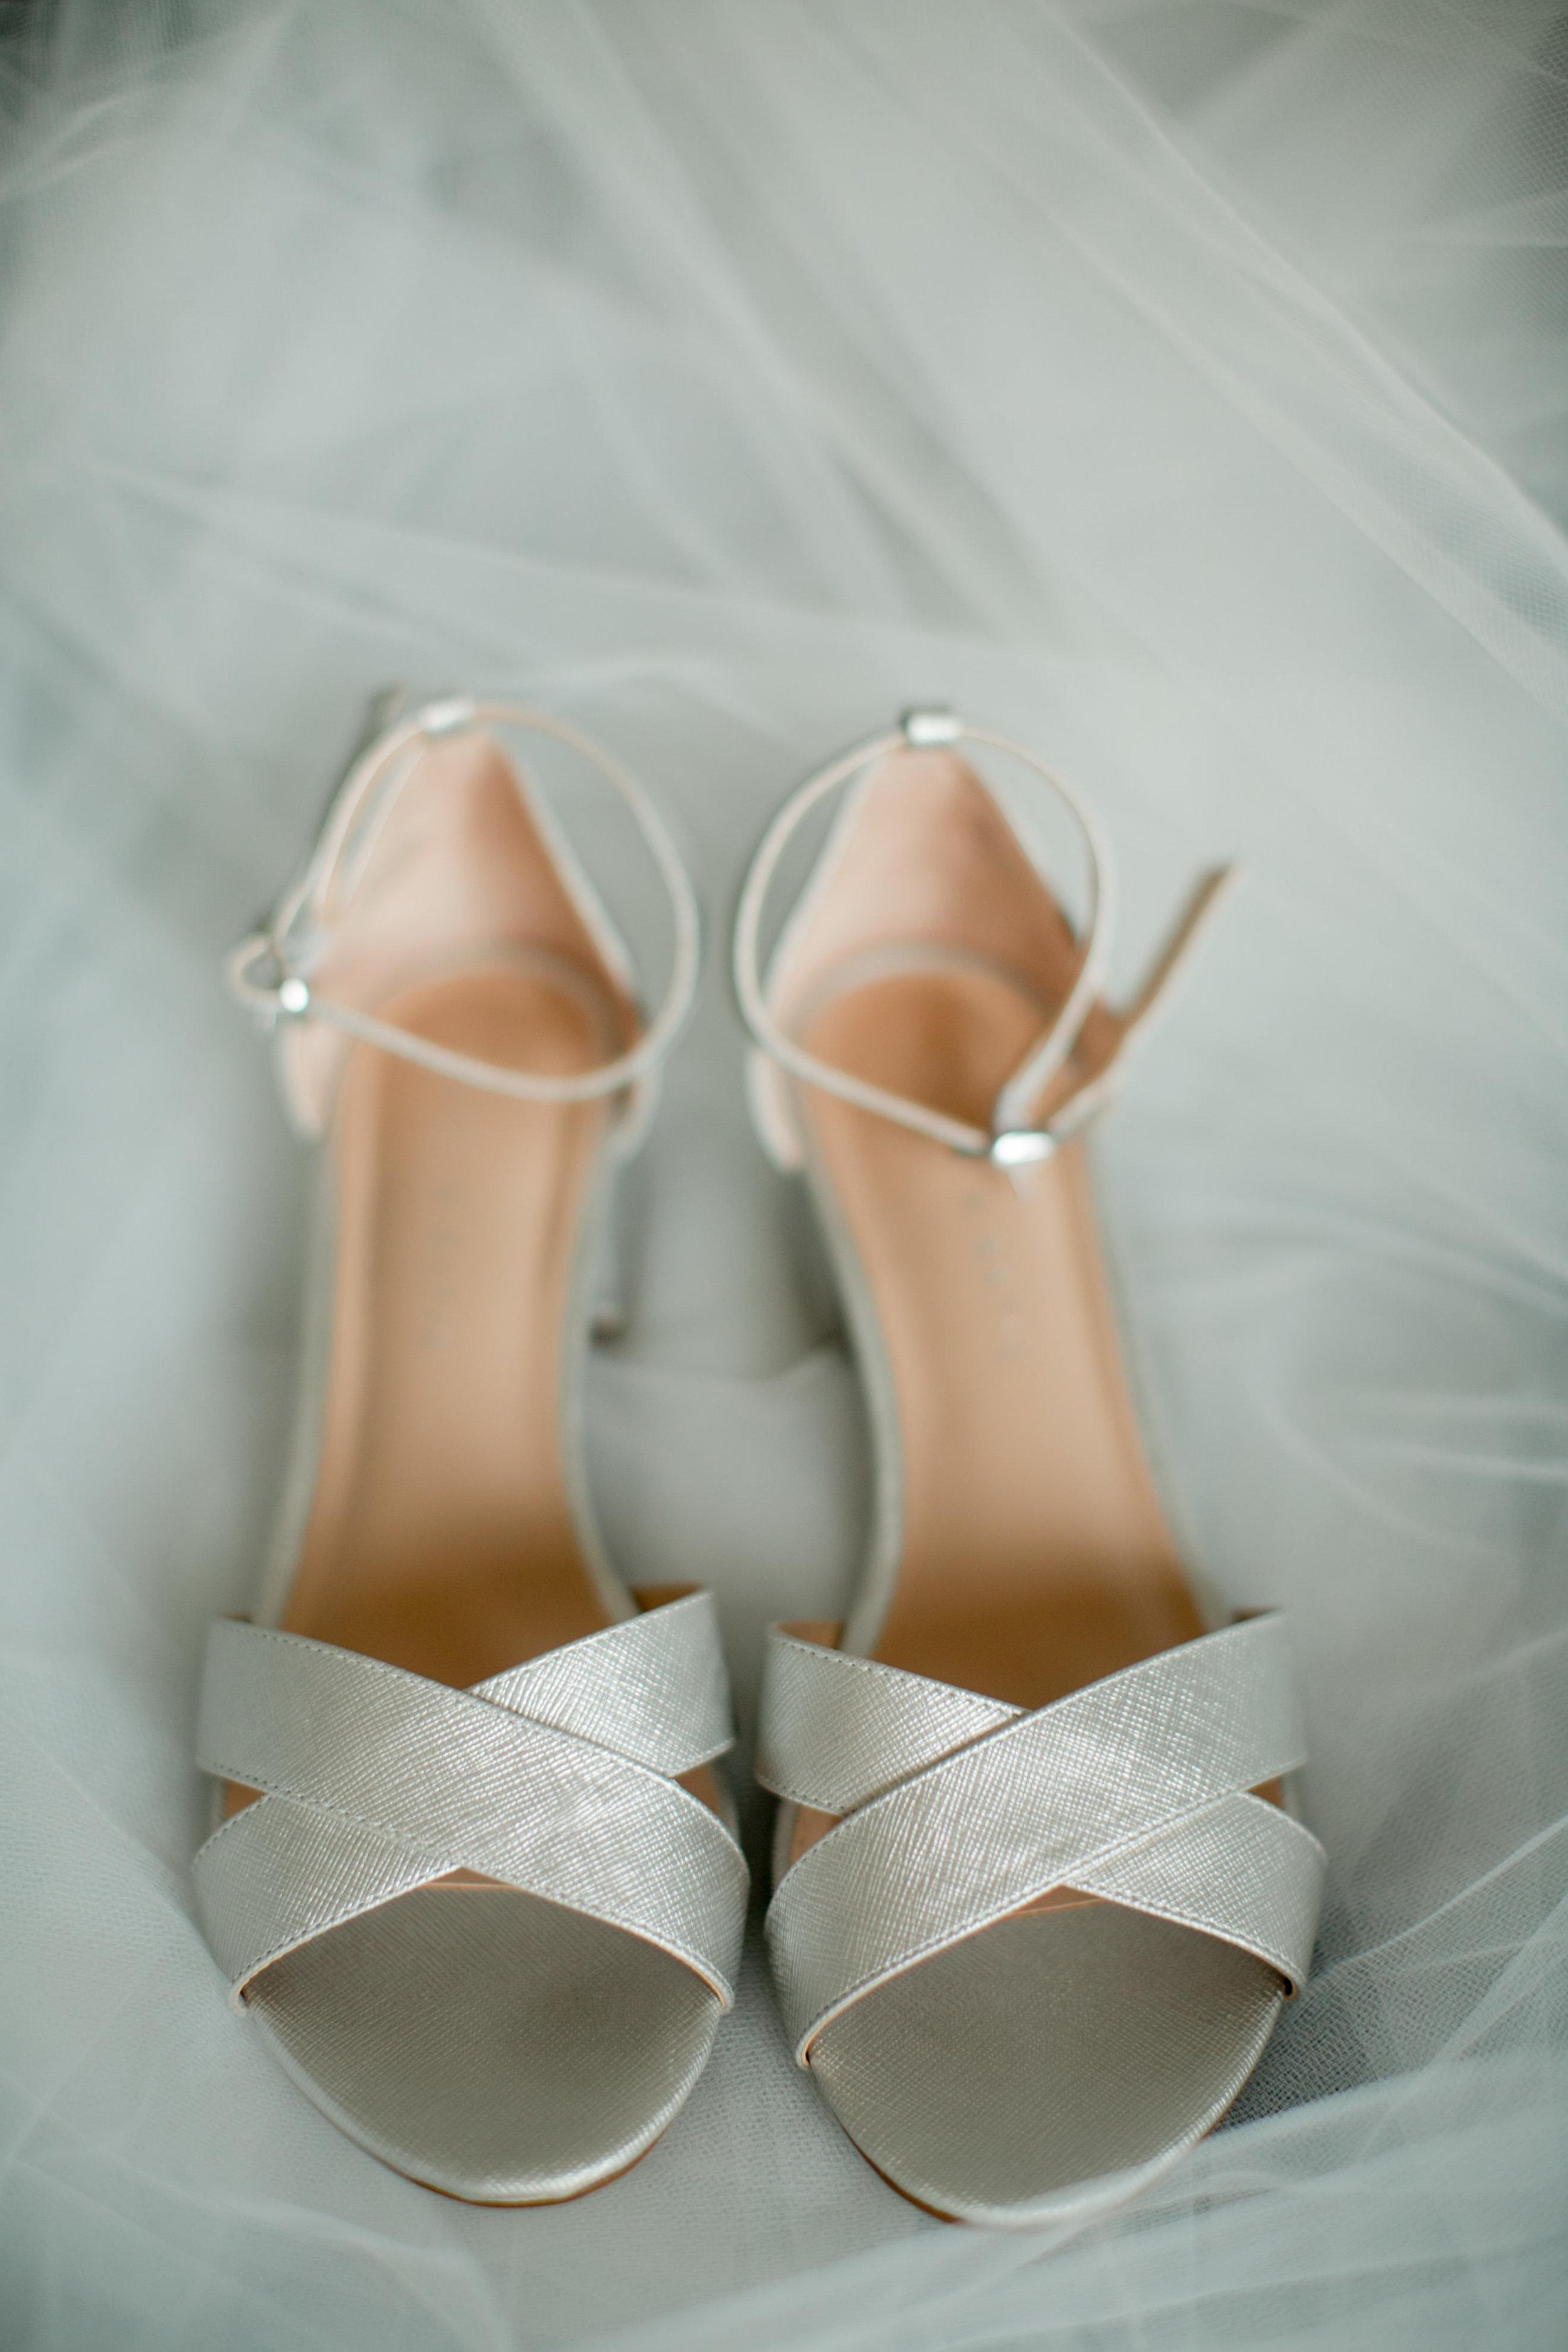 Kimberley + Cameron - Daniel Ricci Weddings - High Res. Finals-55.jpg